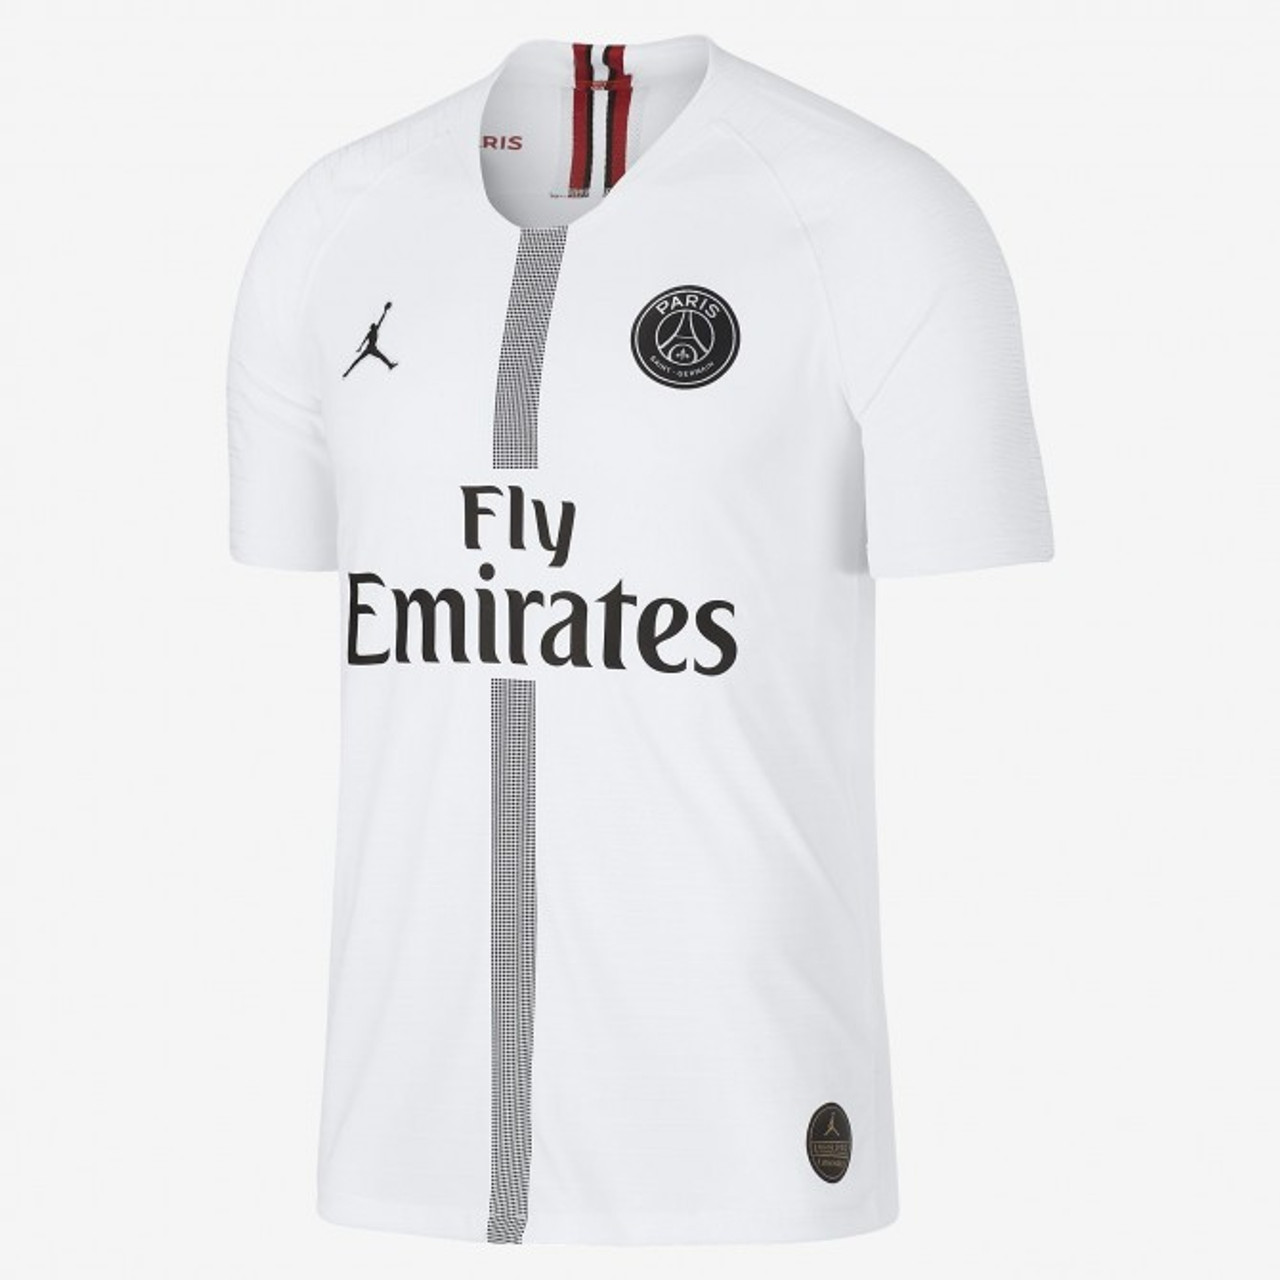 5581cc5b824fdb NIKE PSG JORDAN 2019 VAPOR MATCH 3RD JERSEY WHITE - Soccer Plus